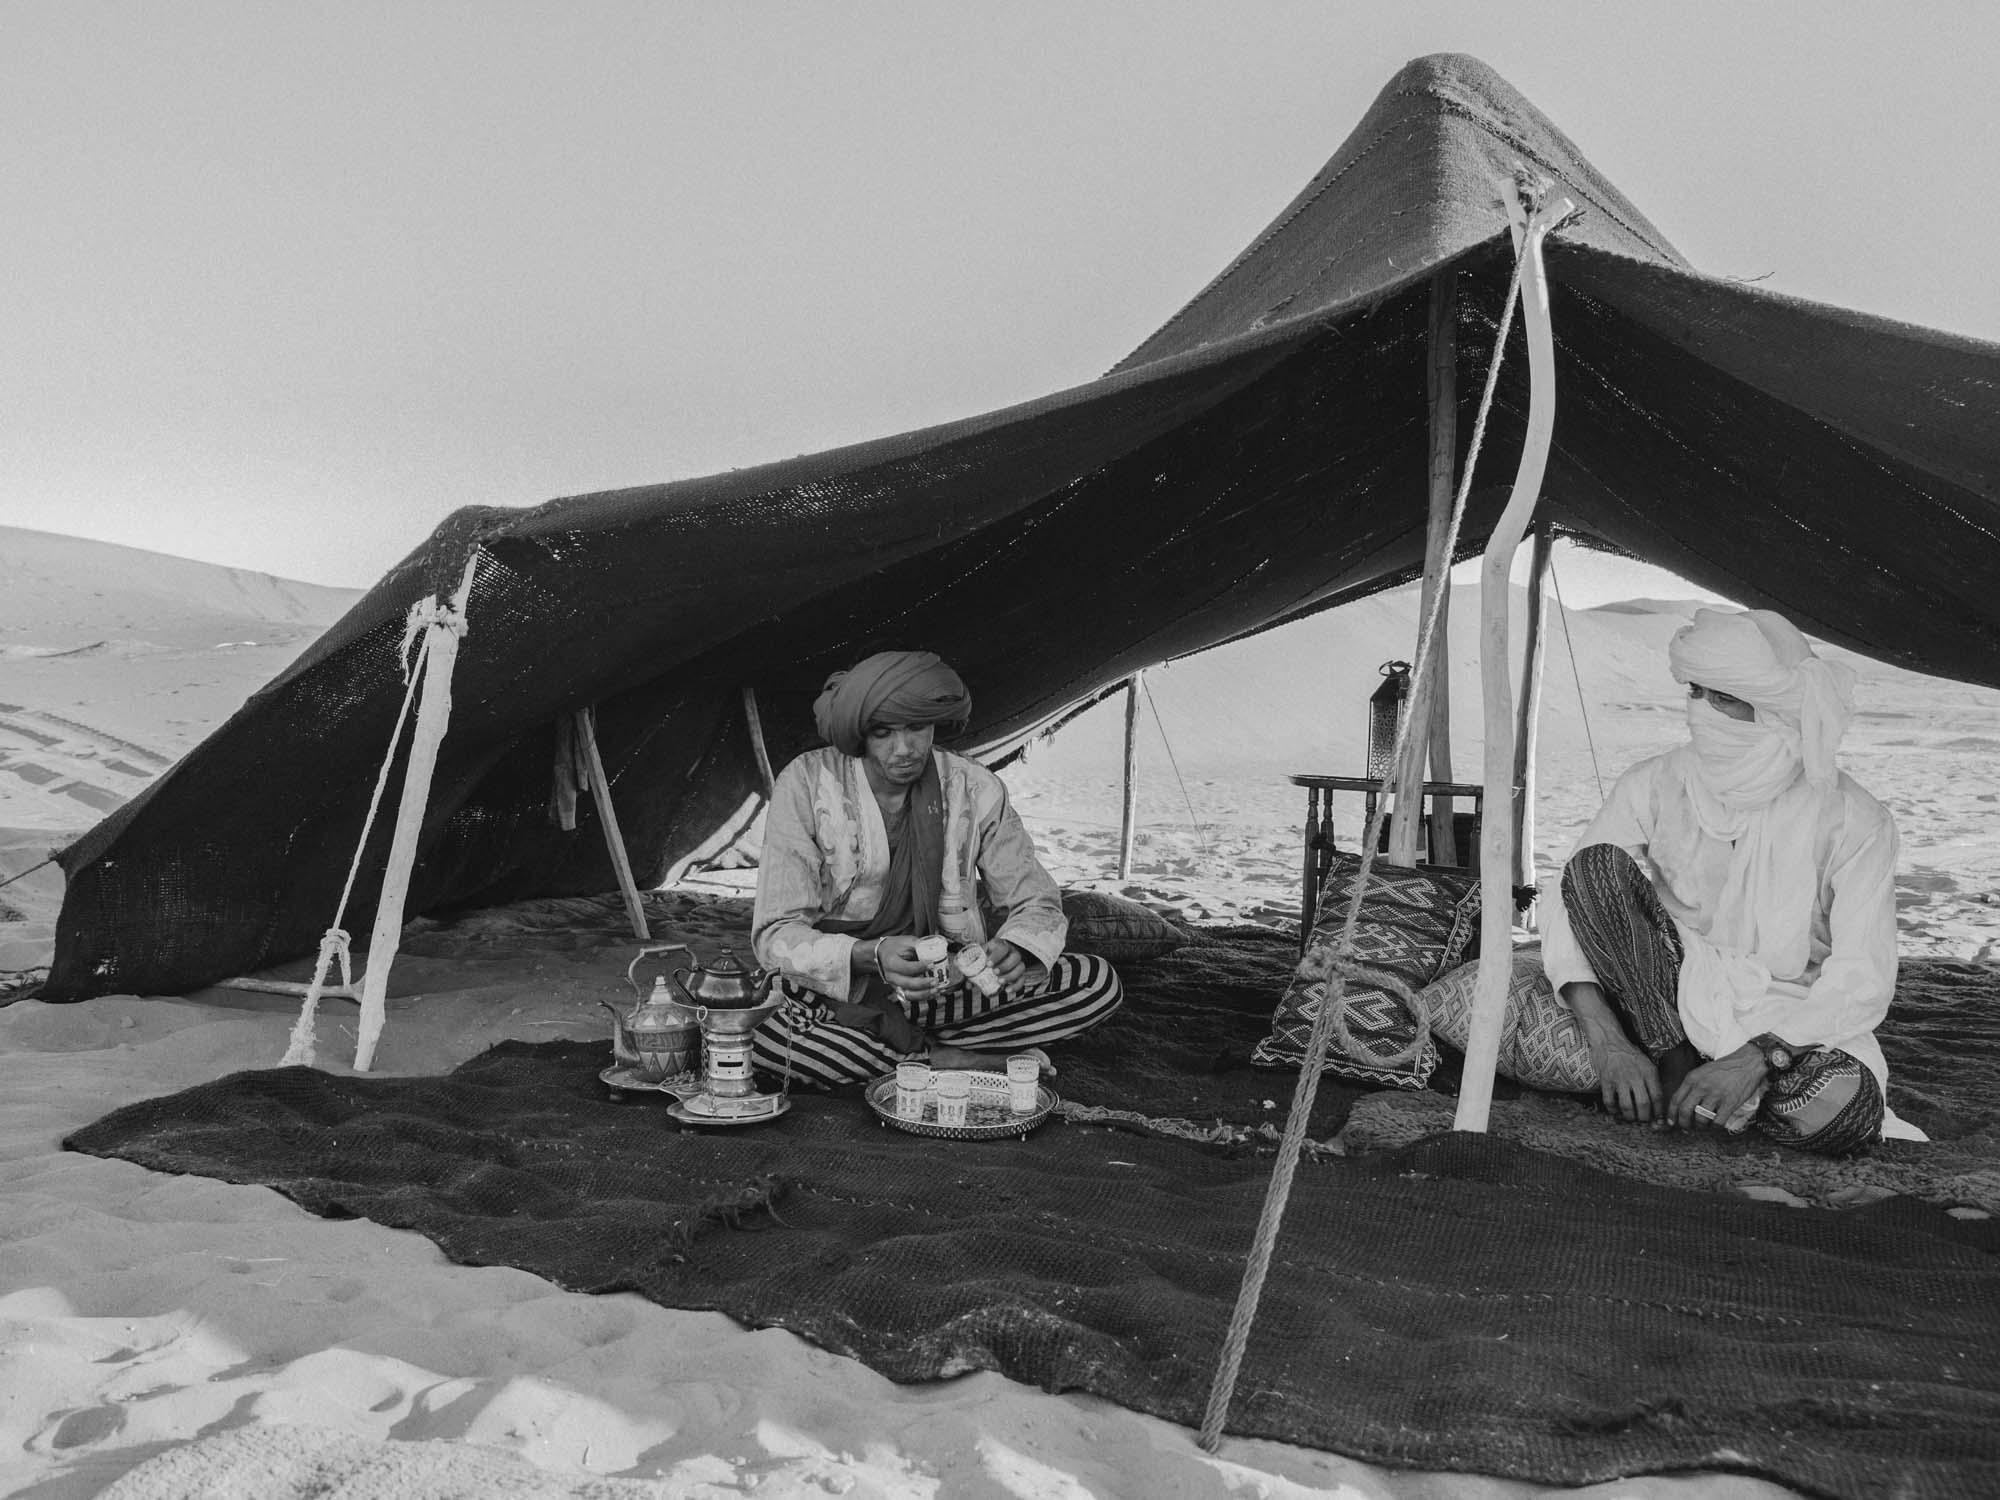 Berber Tour Guides Preparing Tea Under the Shade of Desert Camp